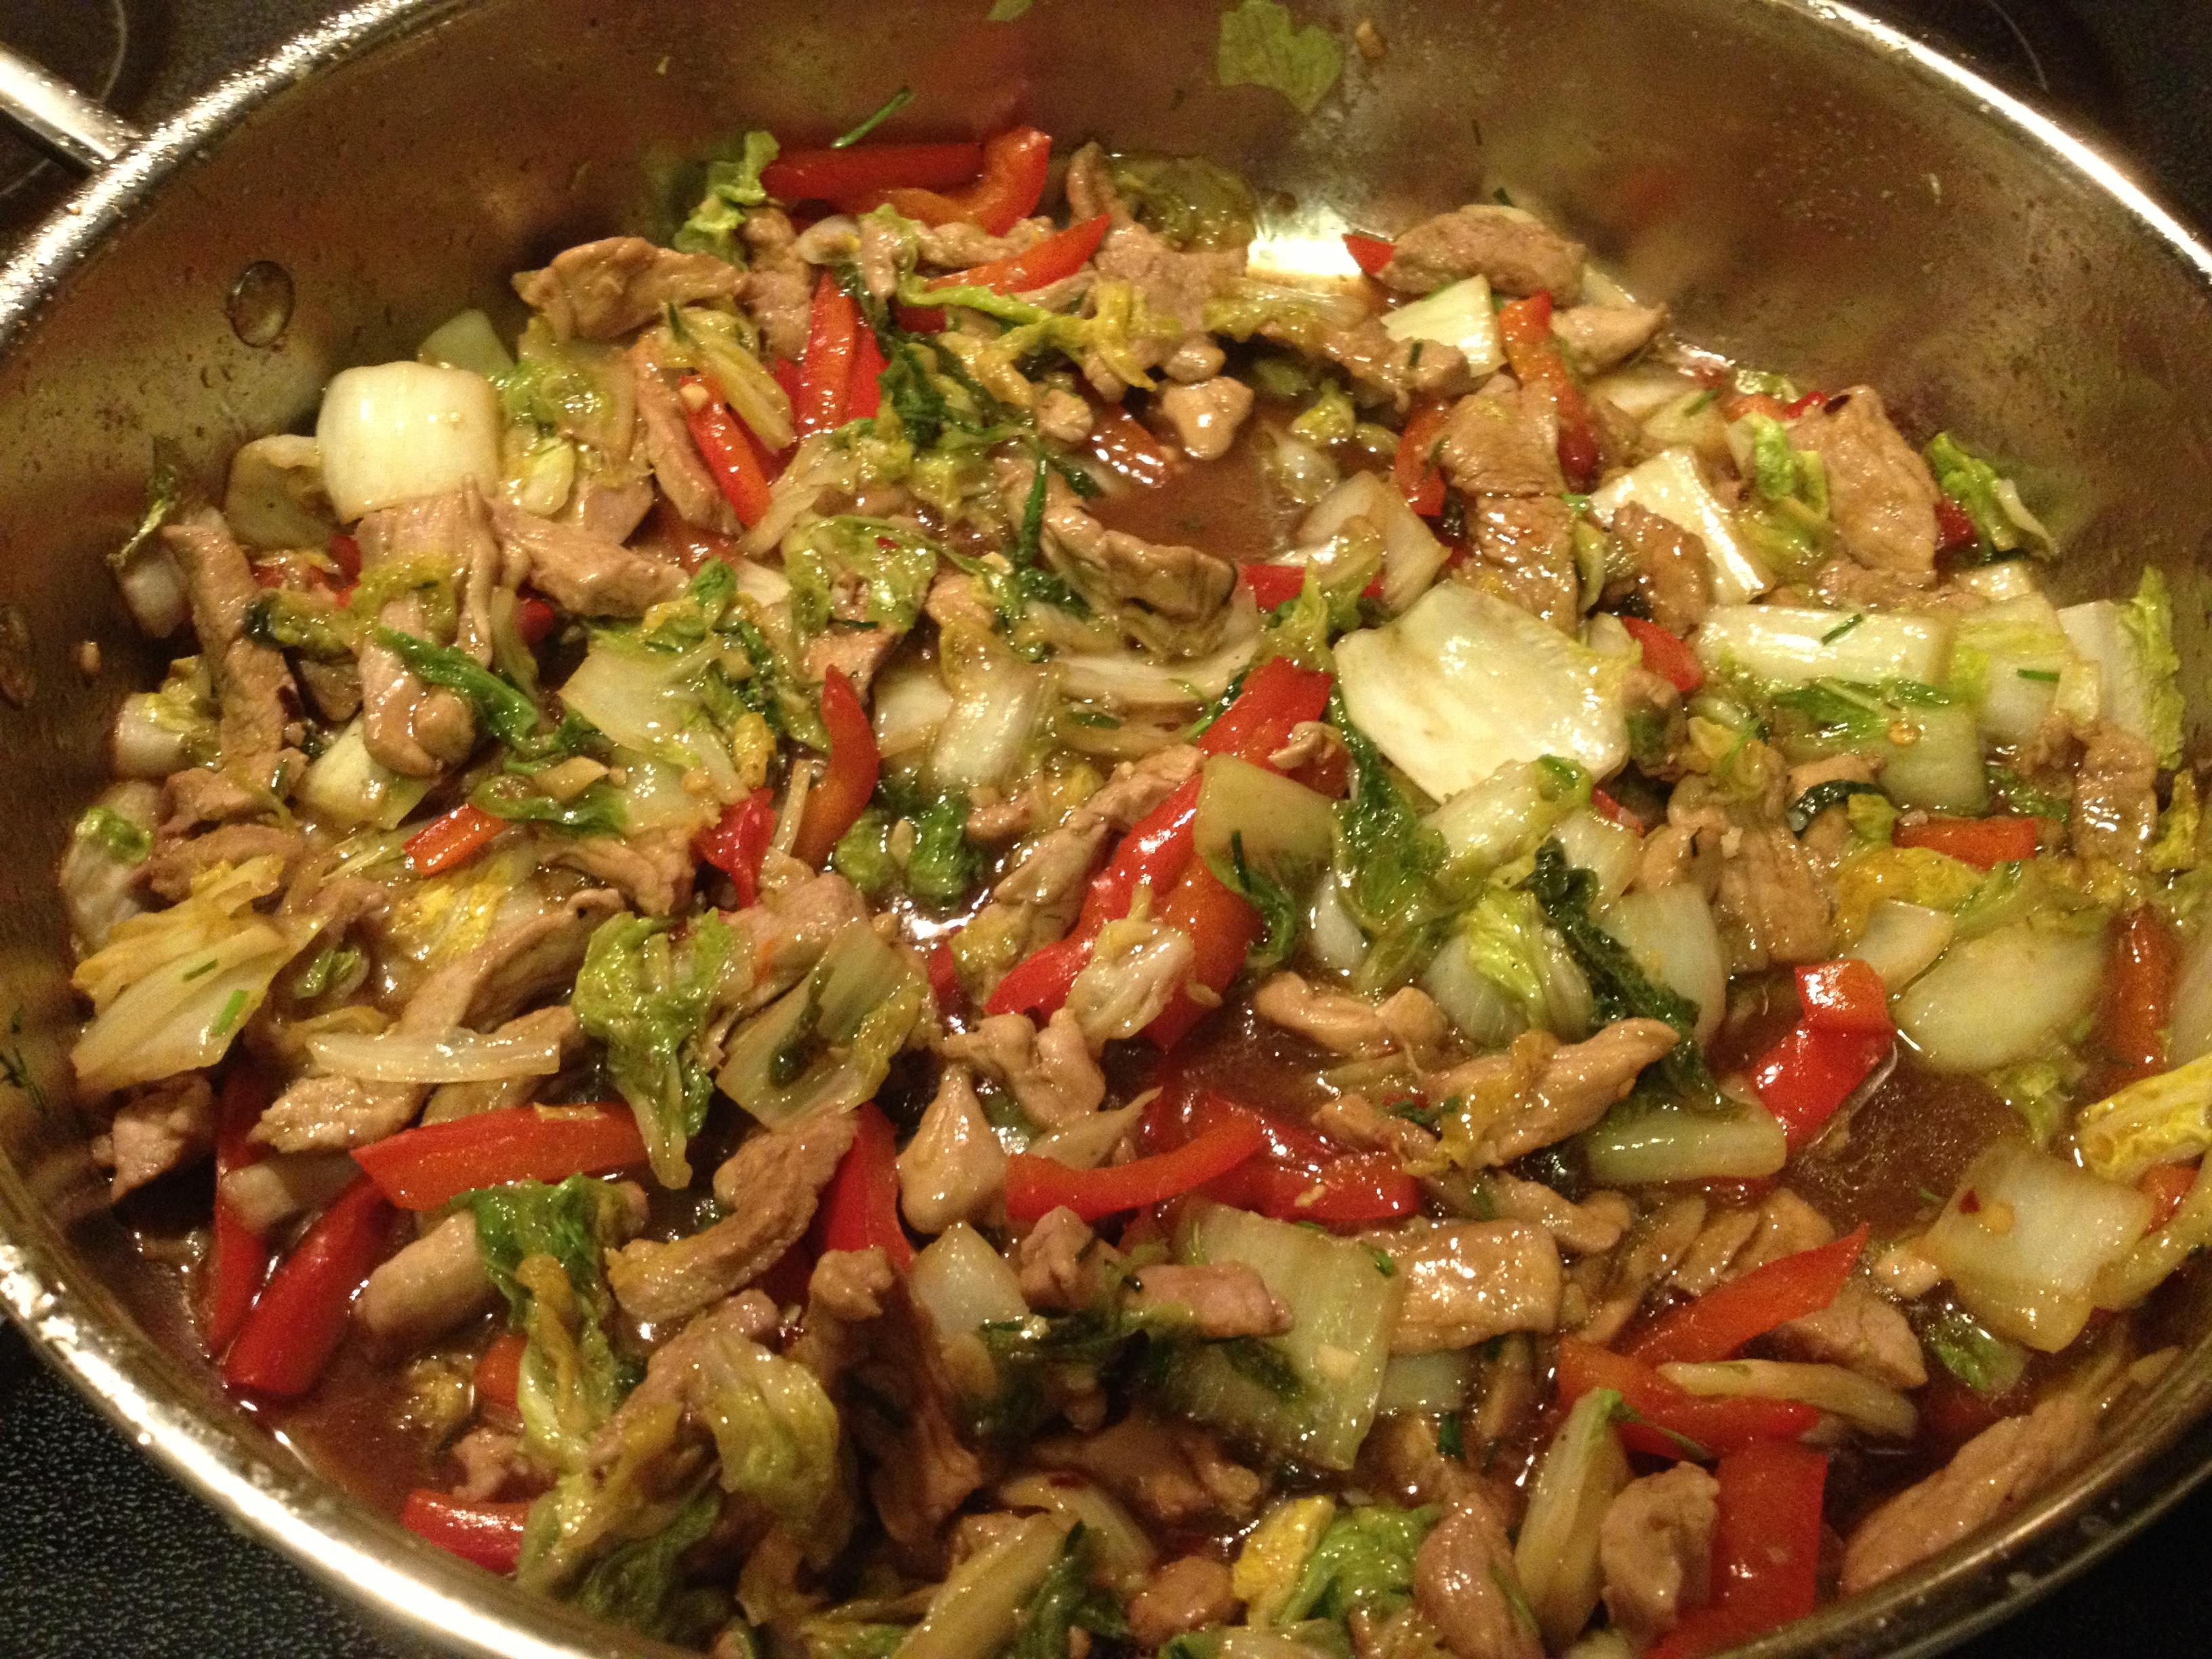 Hoisin Pork Tenderloin Stir-Fry with Napa Cabbage recipe from Grabbing ...